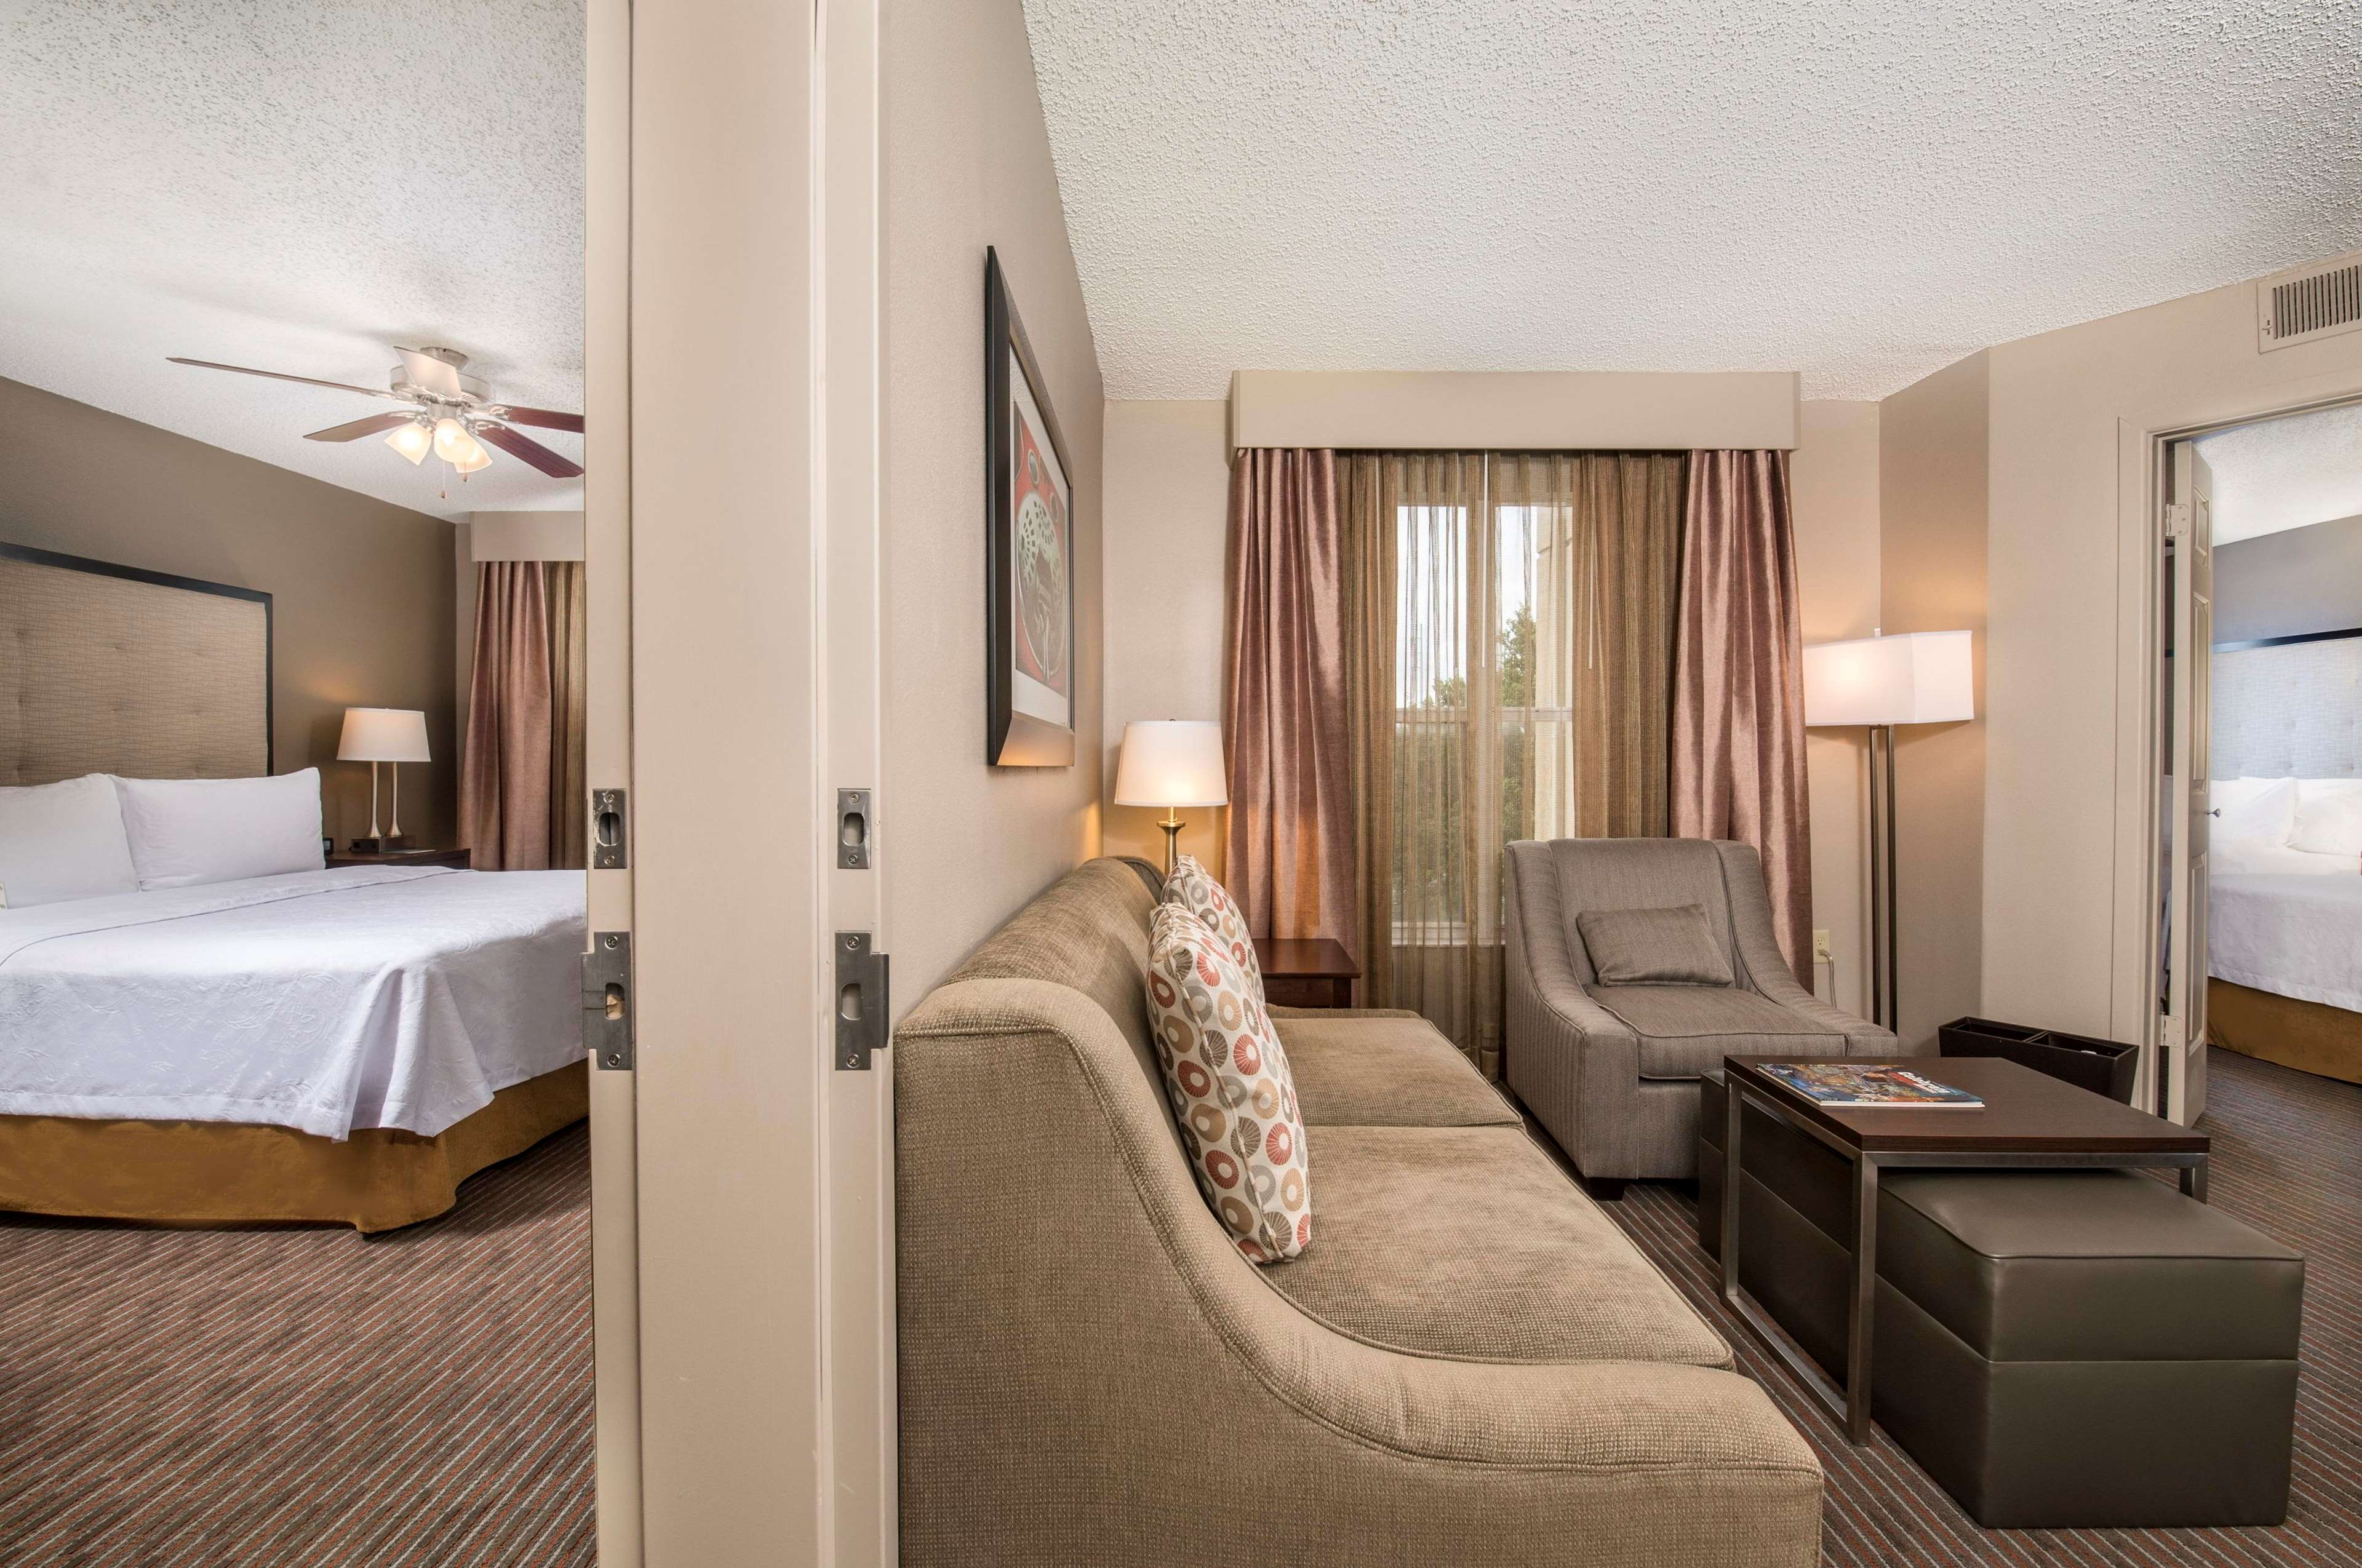 Homewood Suites by Hilton Austin-South/Airport image 14